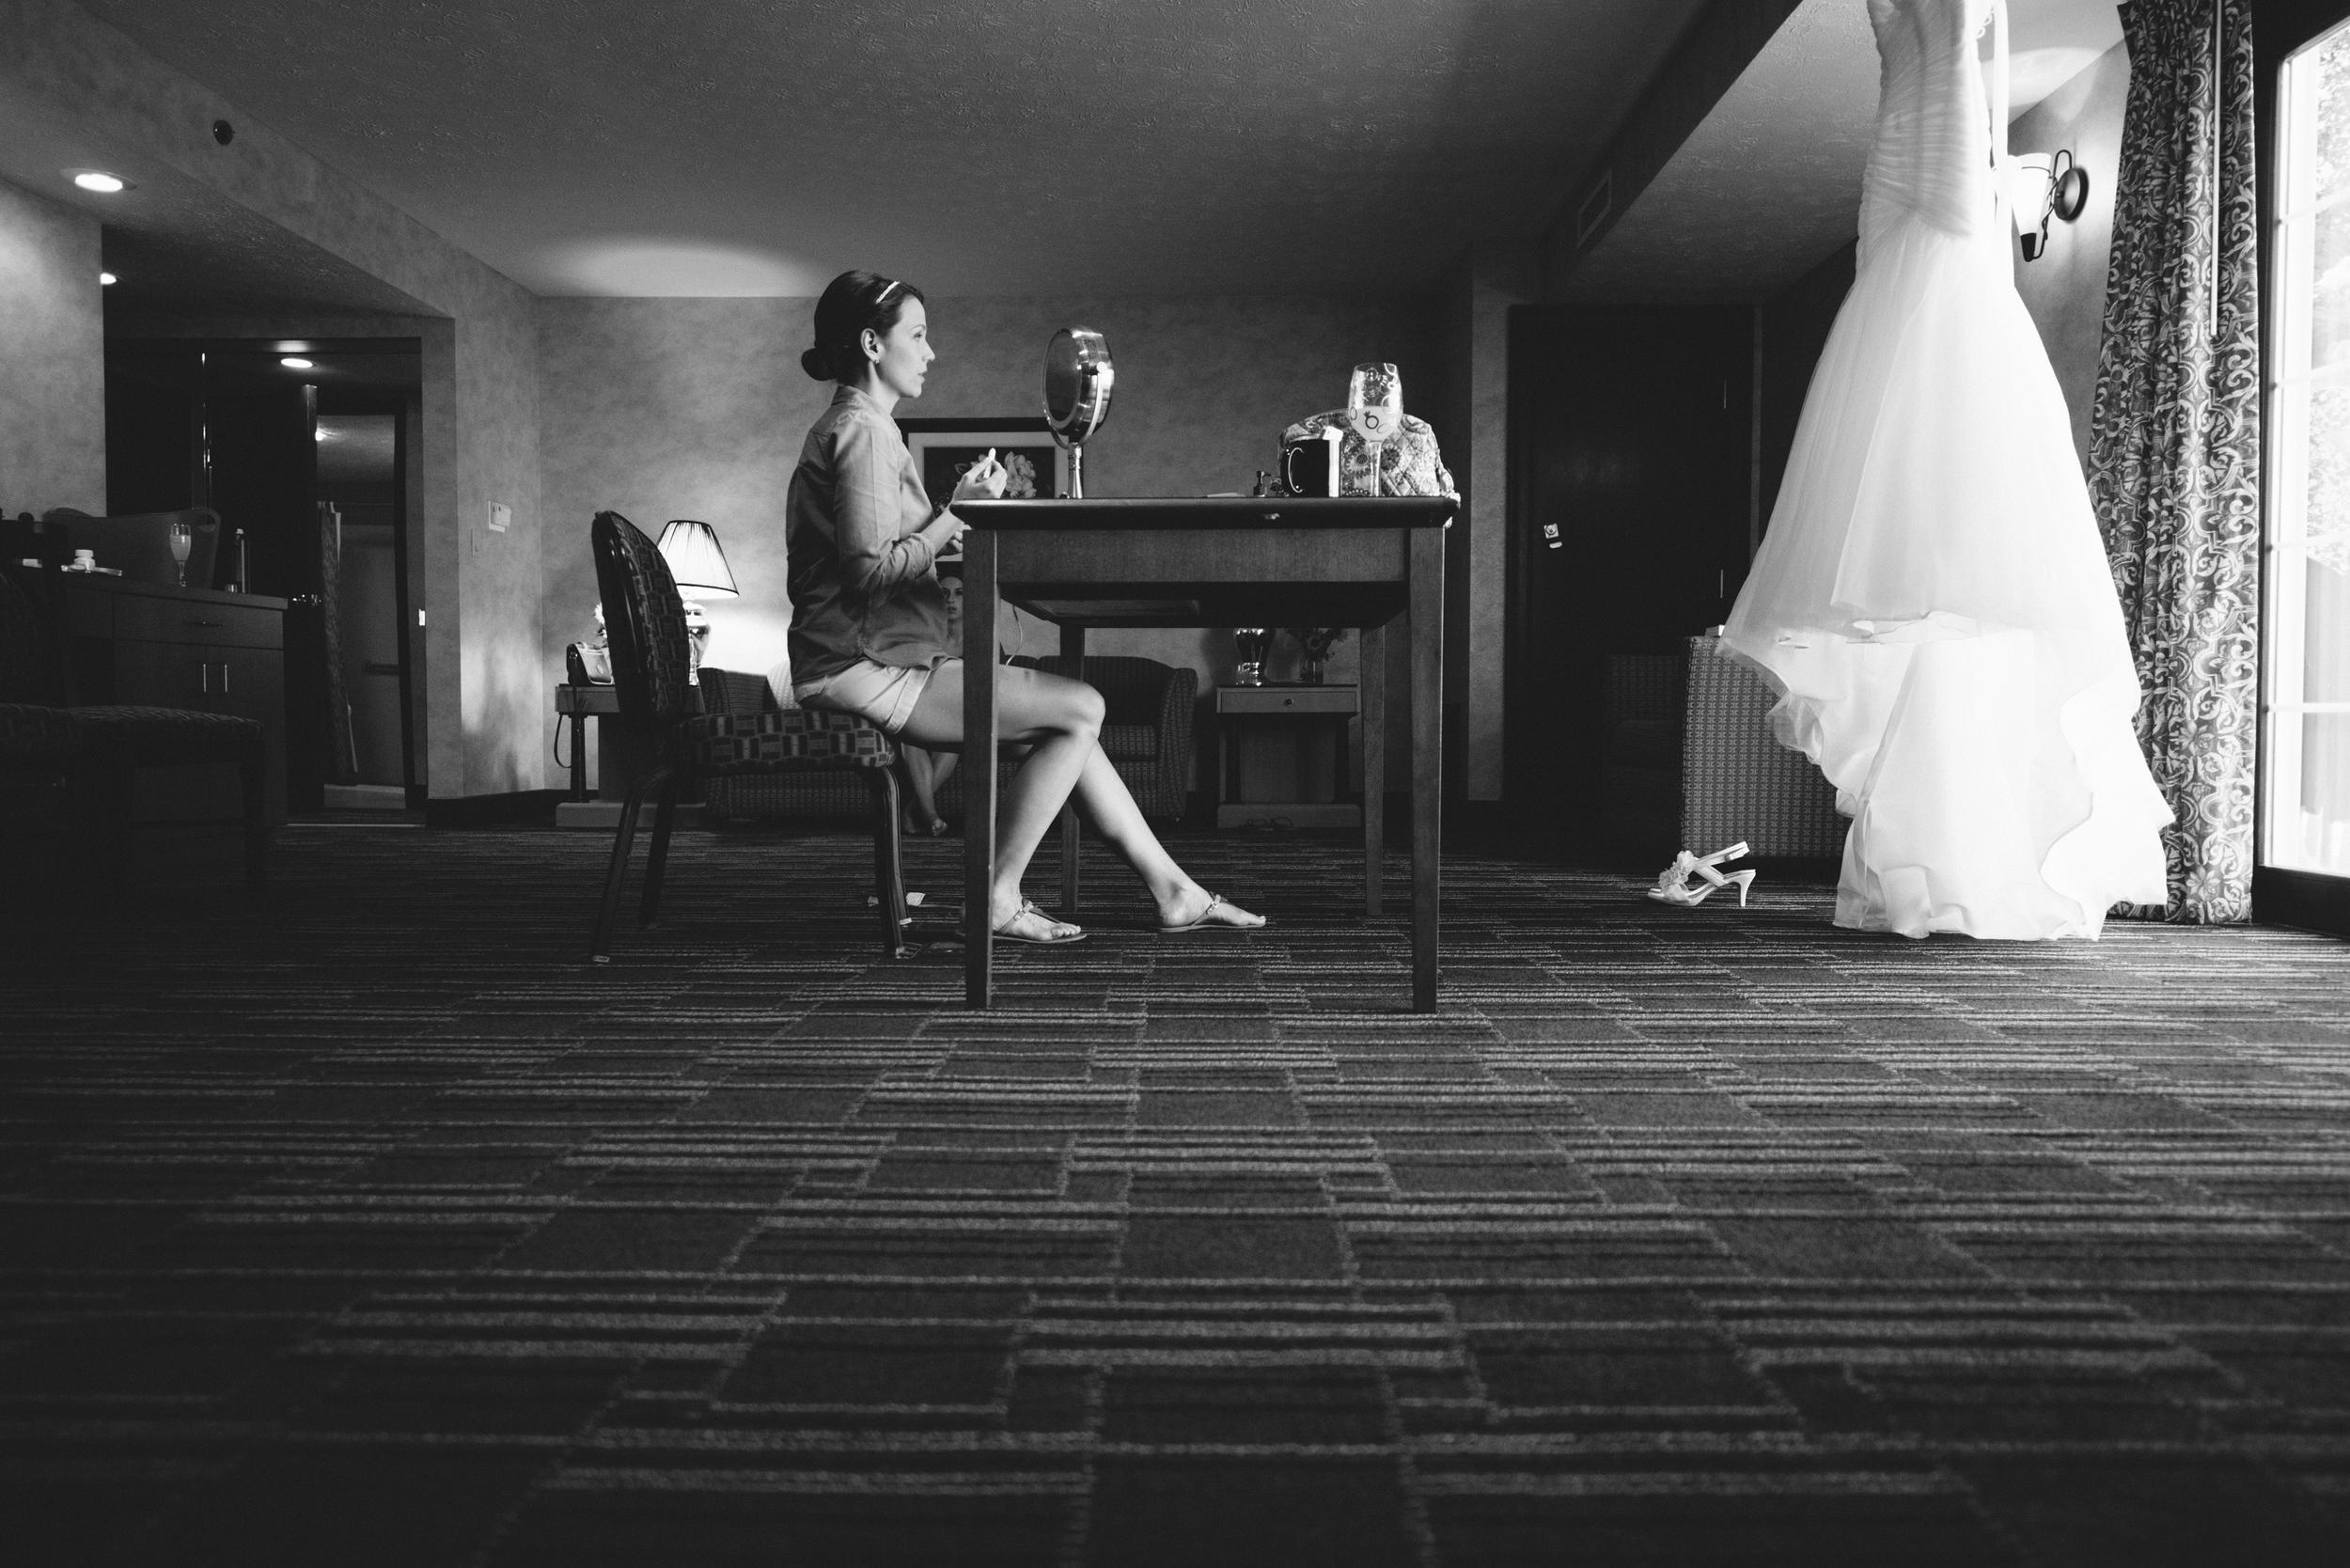 Matt_Swetel_Photography_Erin_and_Jeff_married007.jpg